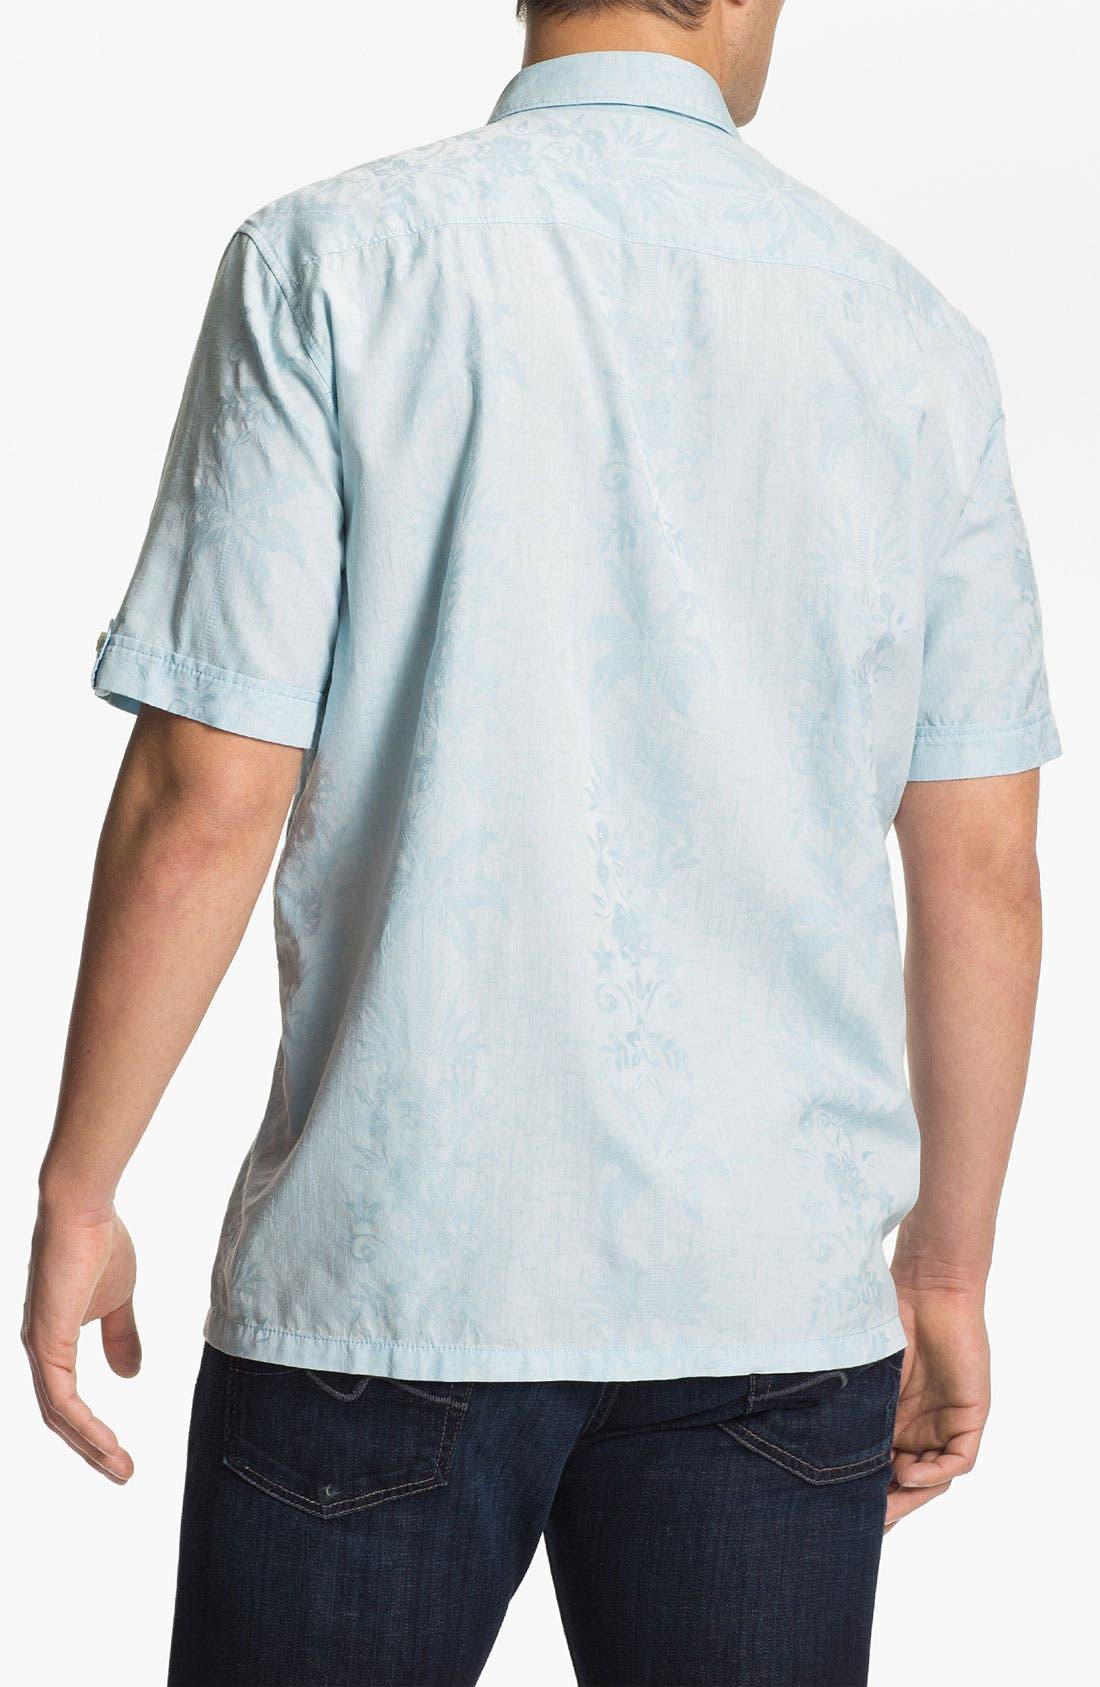 Alternate Image 2  - Tommy Bahama 'Bali Blogger' Campshirt (Big & Tall)